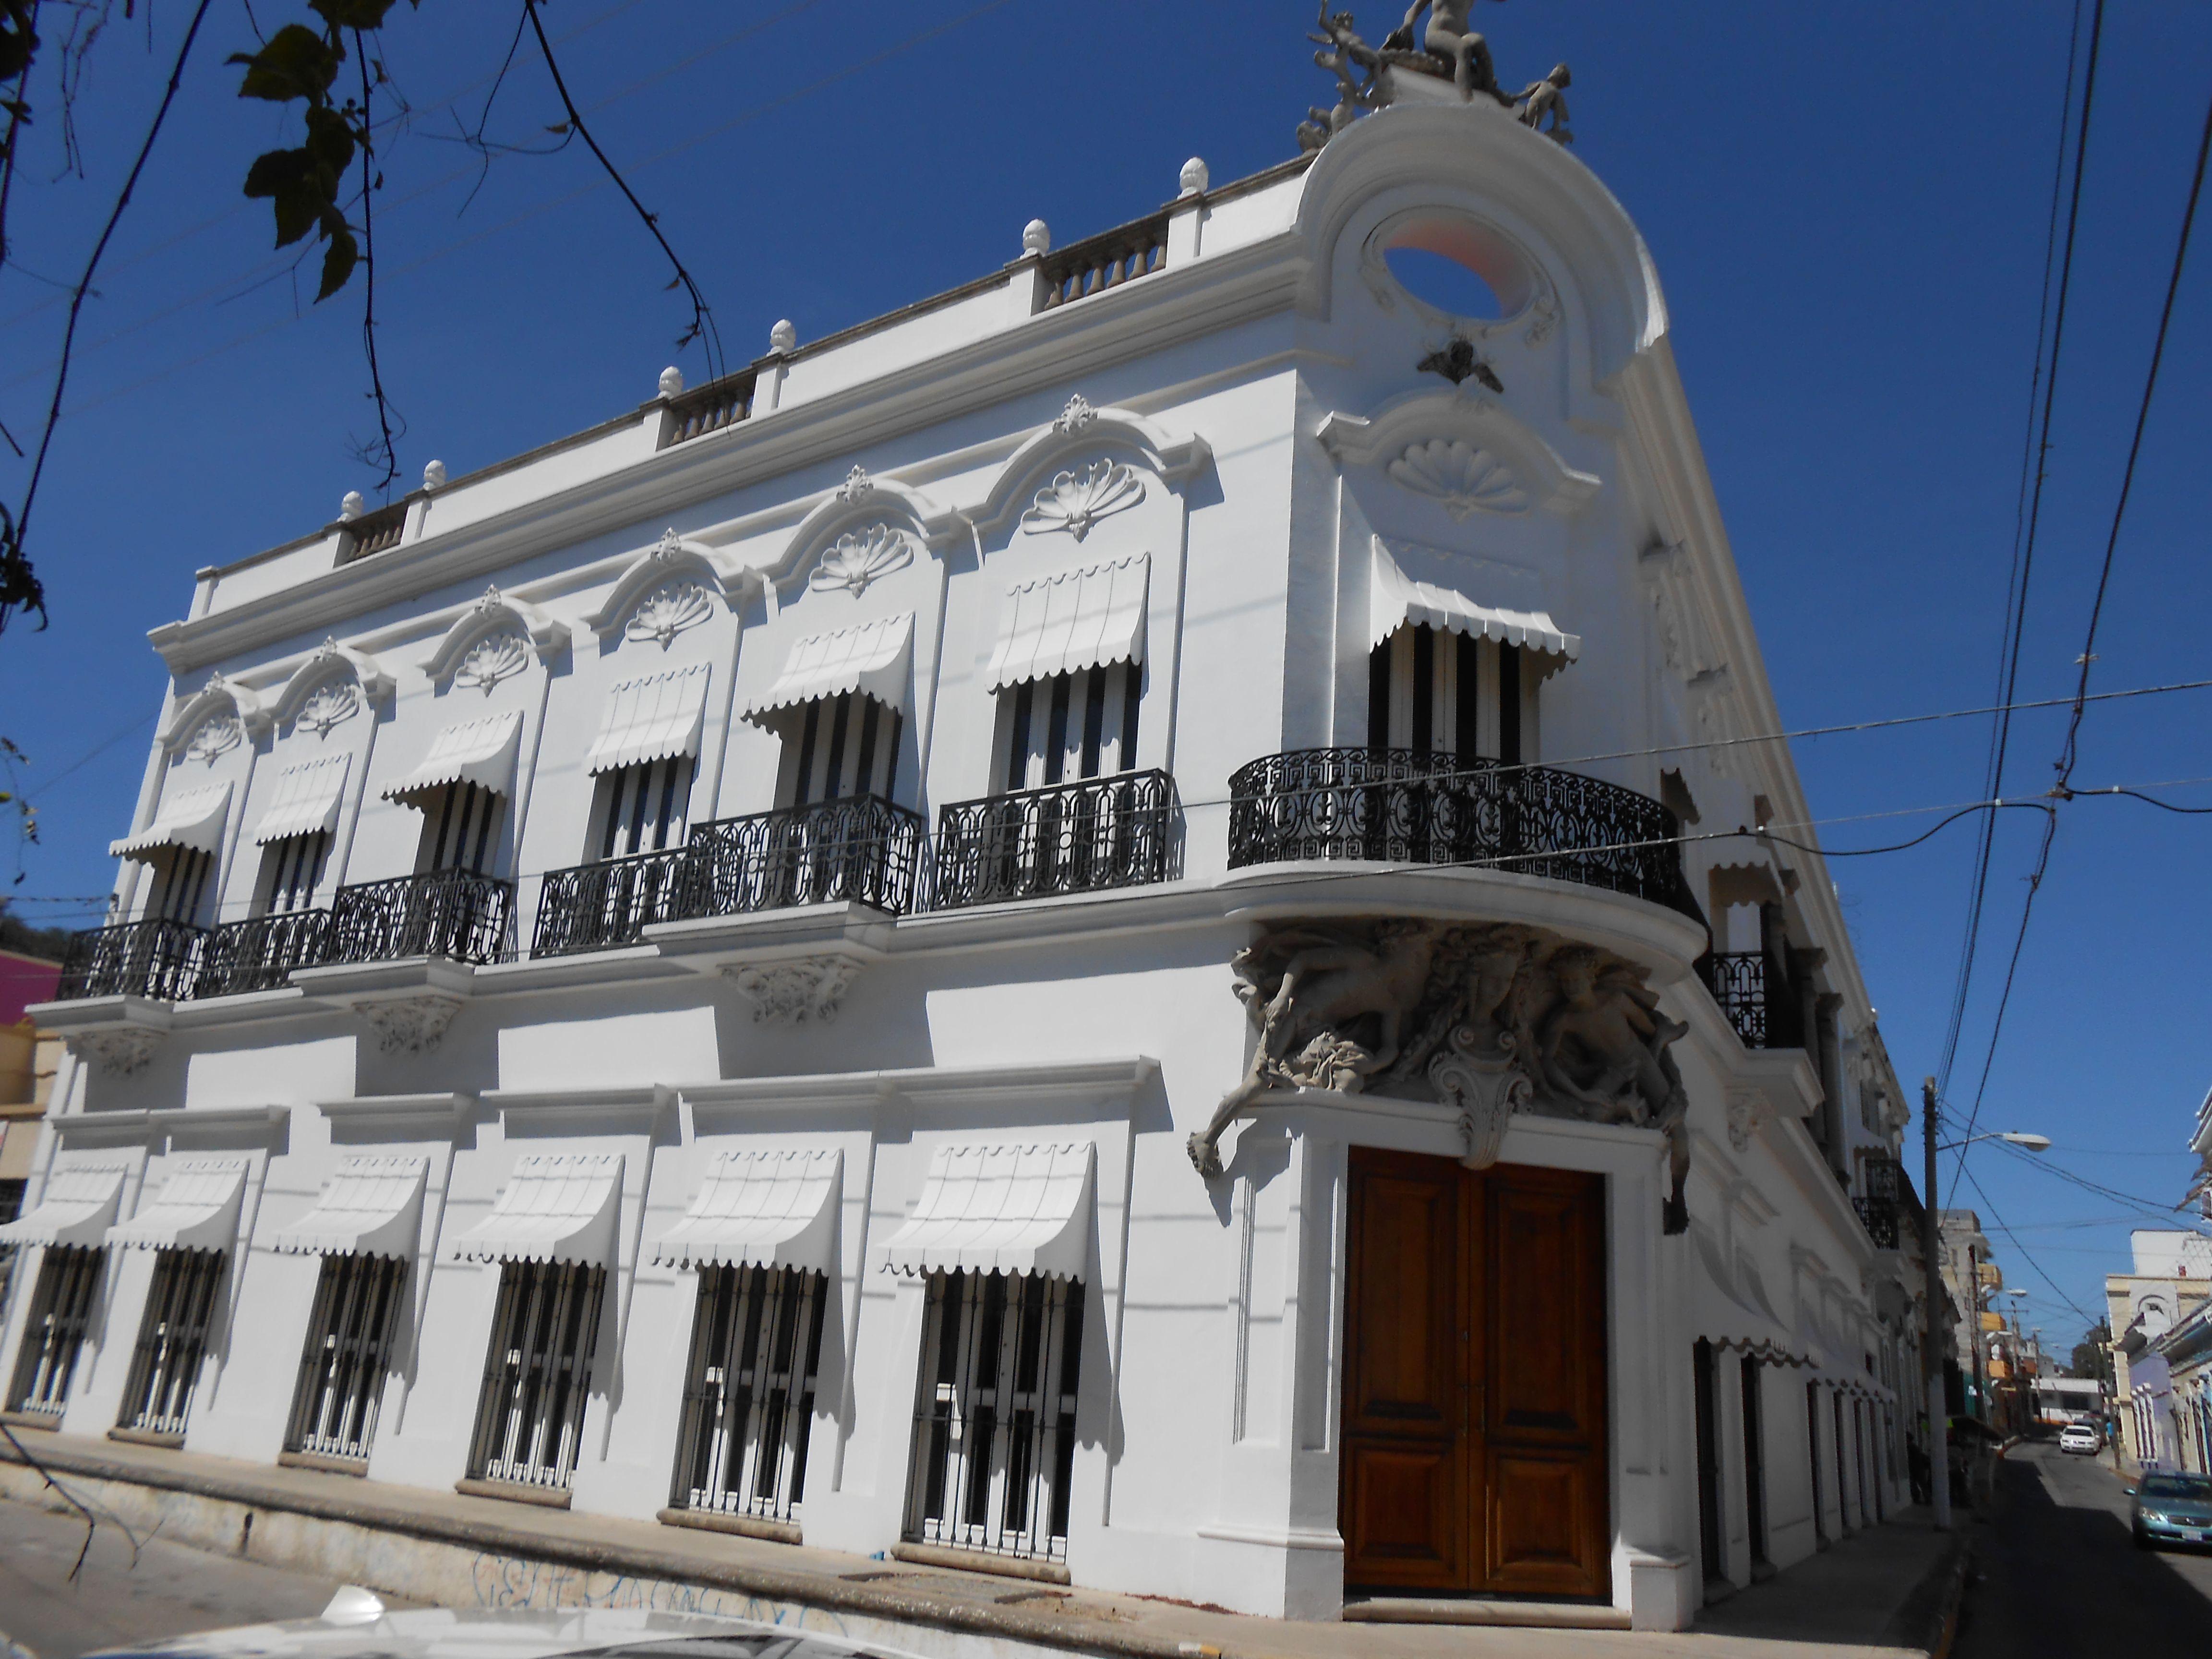 Otra Belleza En Mazatlan Sinaloa Arquitectura Antigua De Mexico  # Muebles Mazatlan Sinaloa